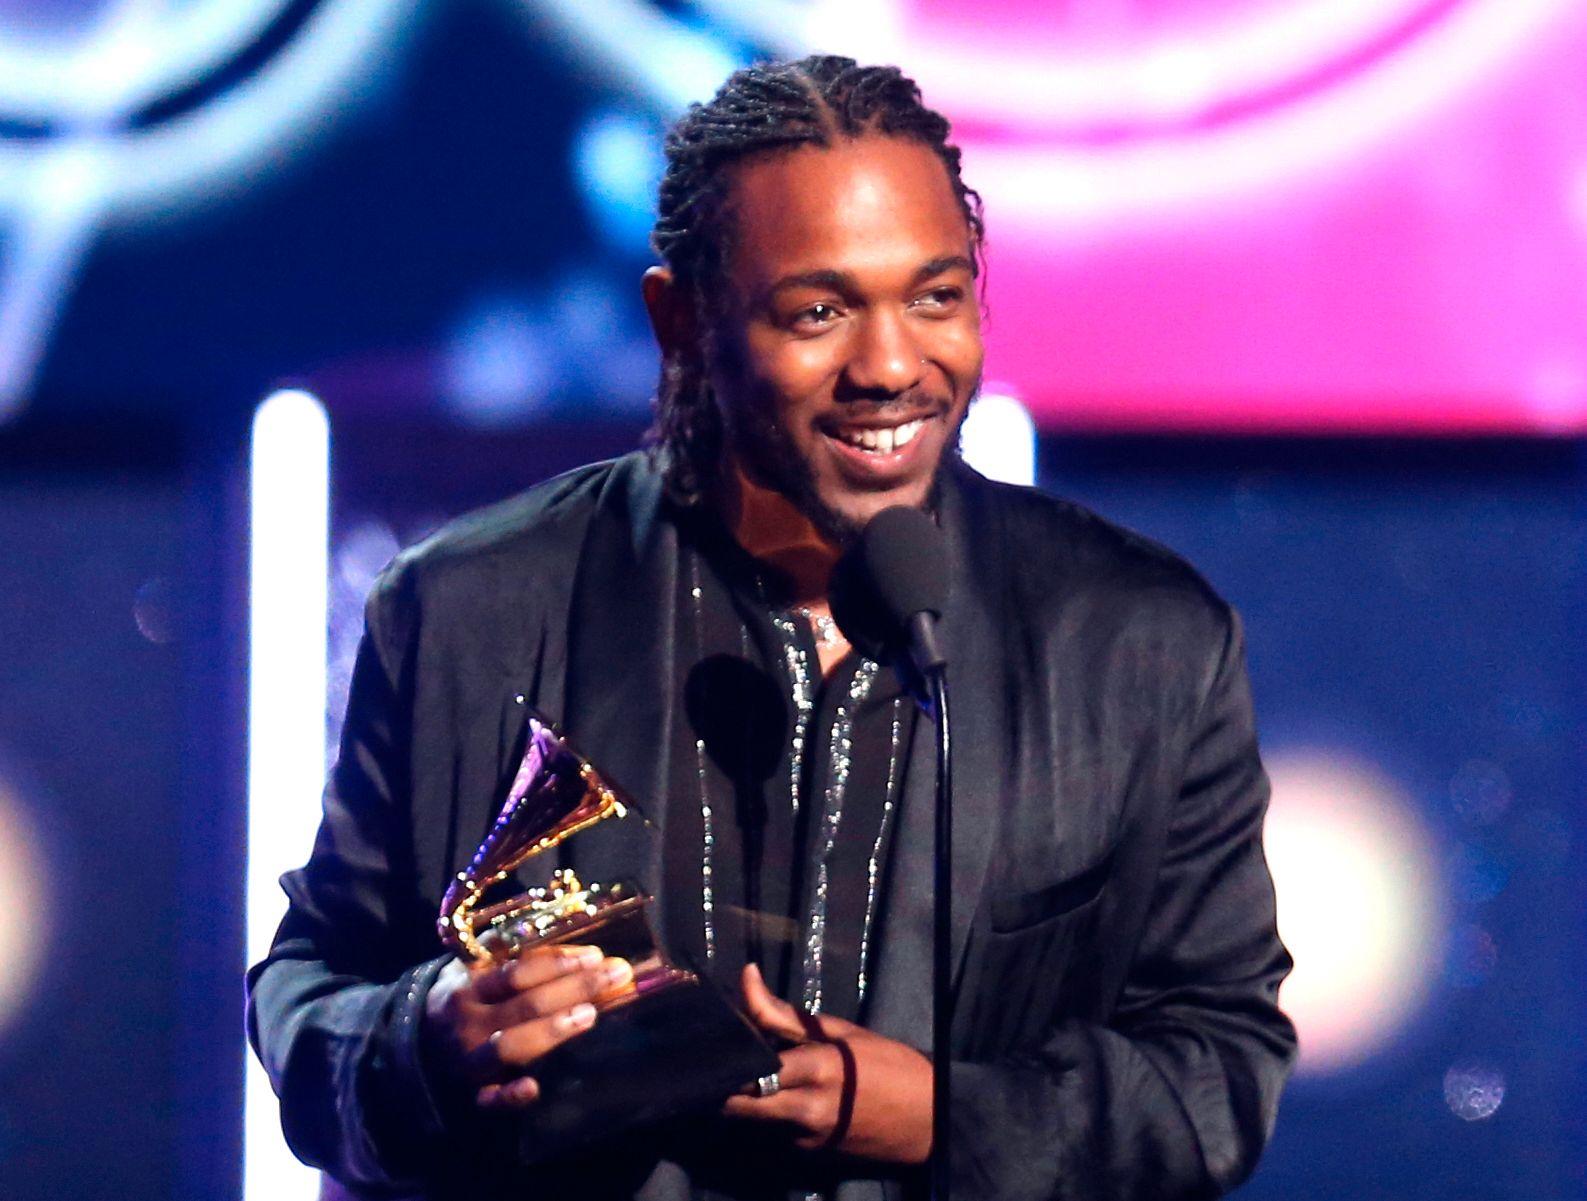 VINNER: Tidligere i år vant Kendrick Lamar fem Grammys. I dag vant han en Pulitzer-pris.